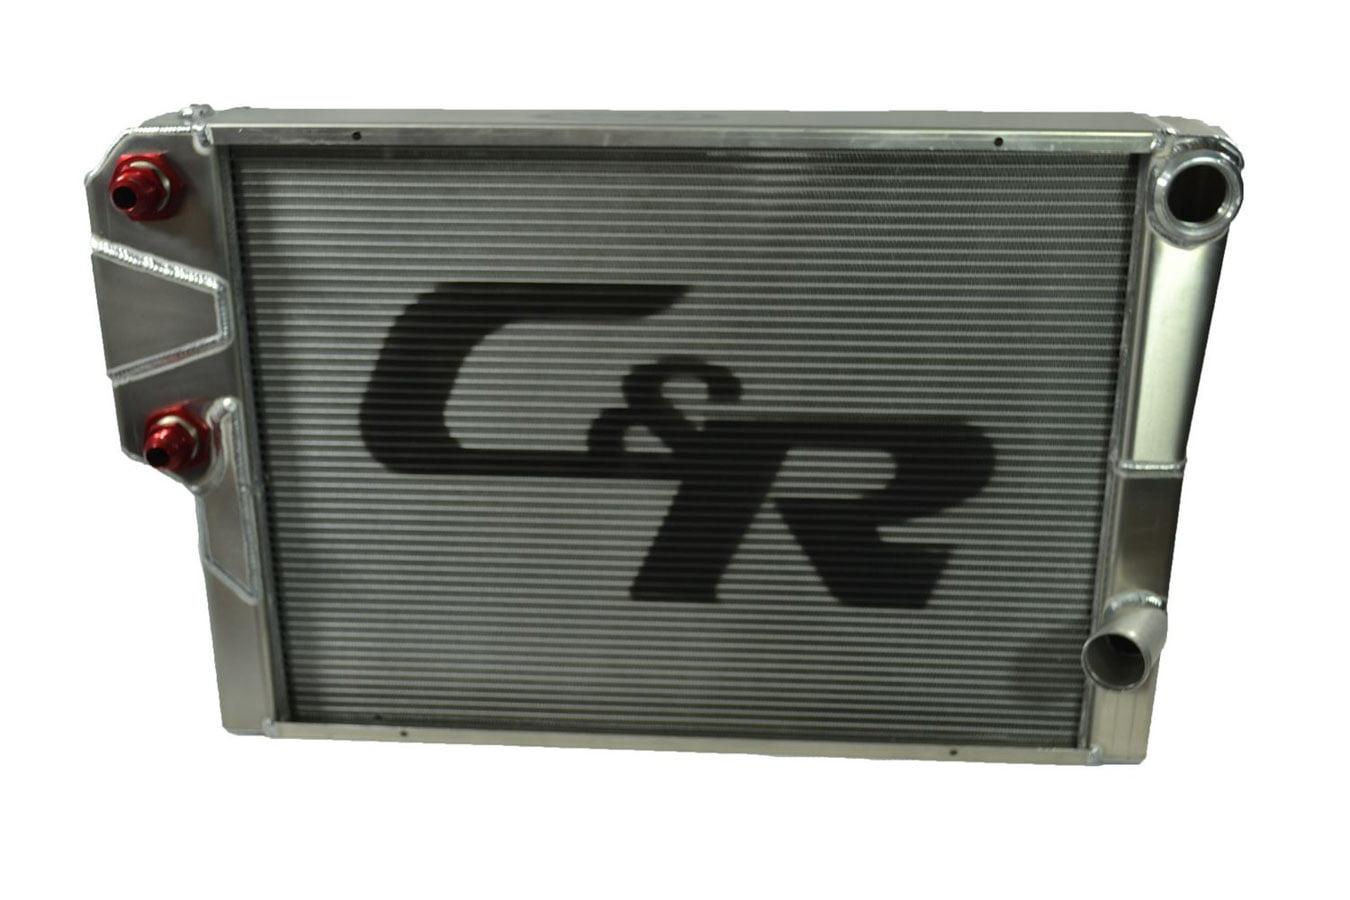 C AND R 30 in W x 18-9 16 in H x 1-1 2 in D Crossflow Radiator P N 818-30191 by C AND R Racing RADIATORS